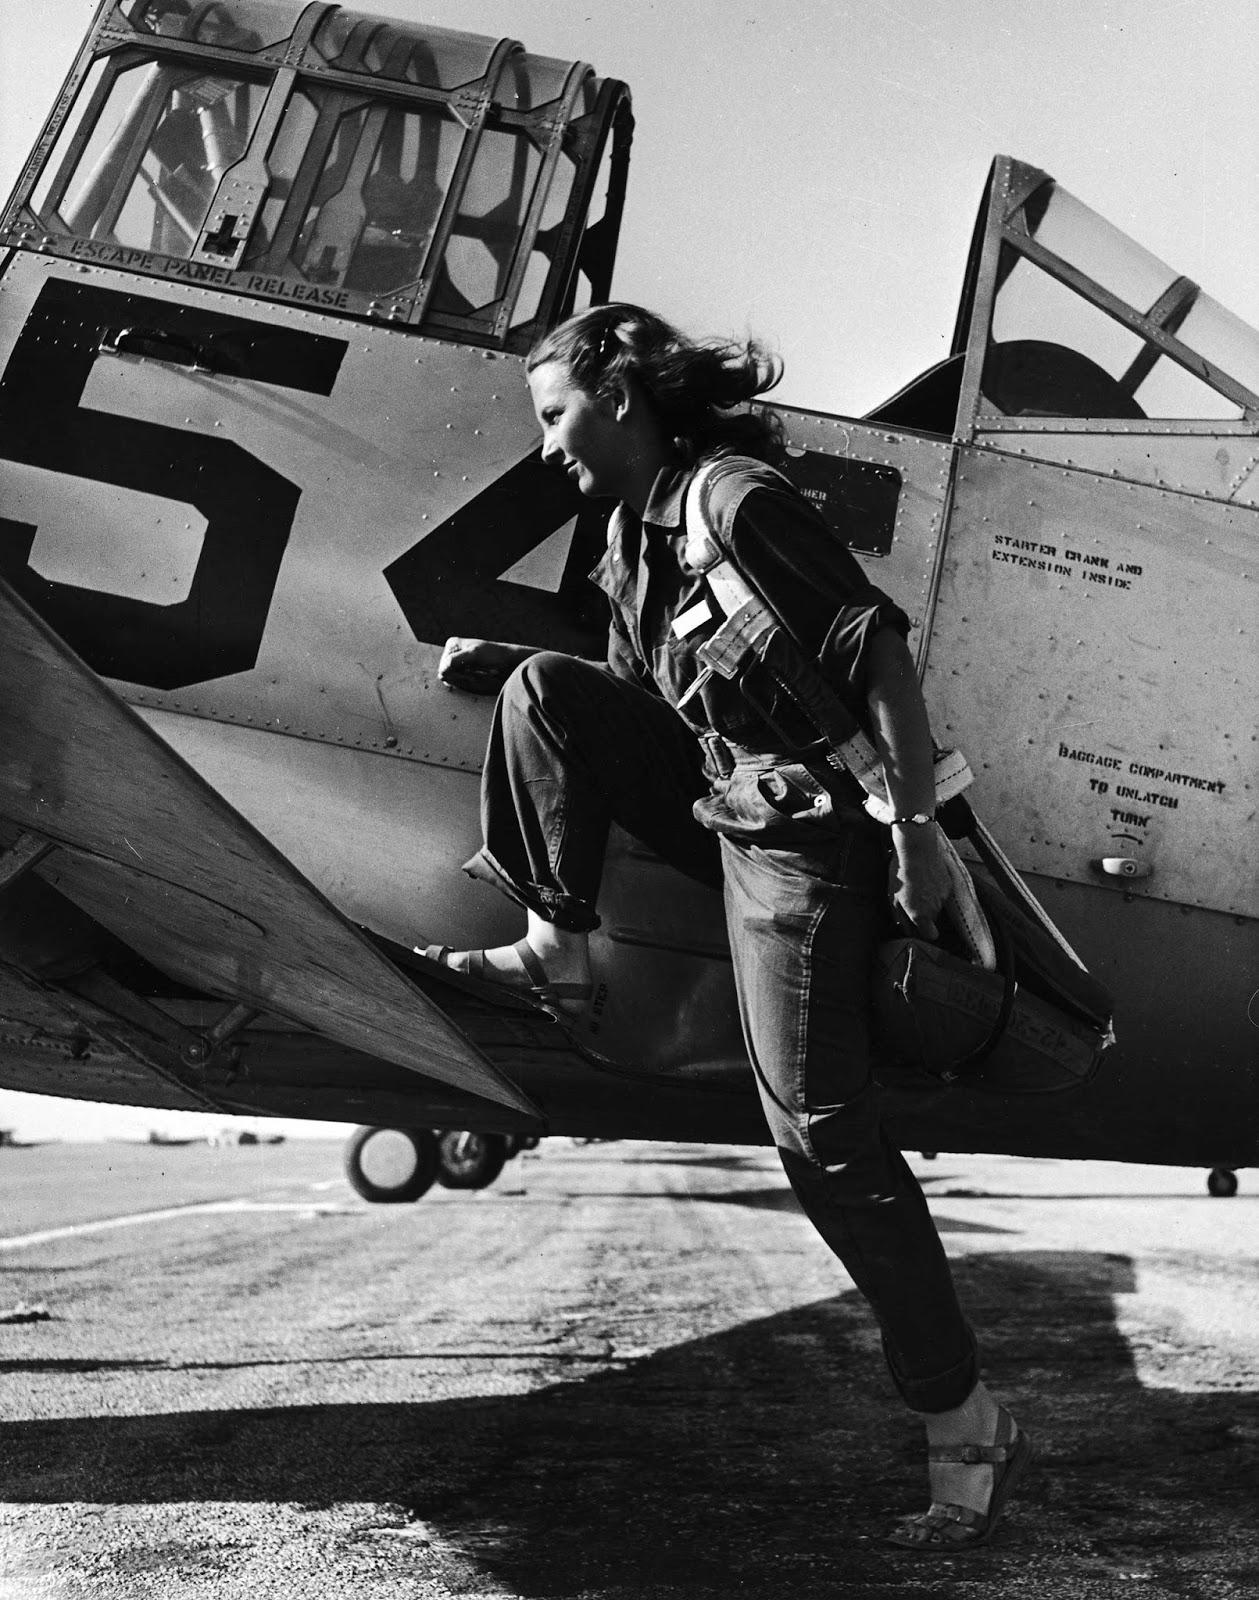 21 Interesting Black and White Photographs Document Female